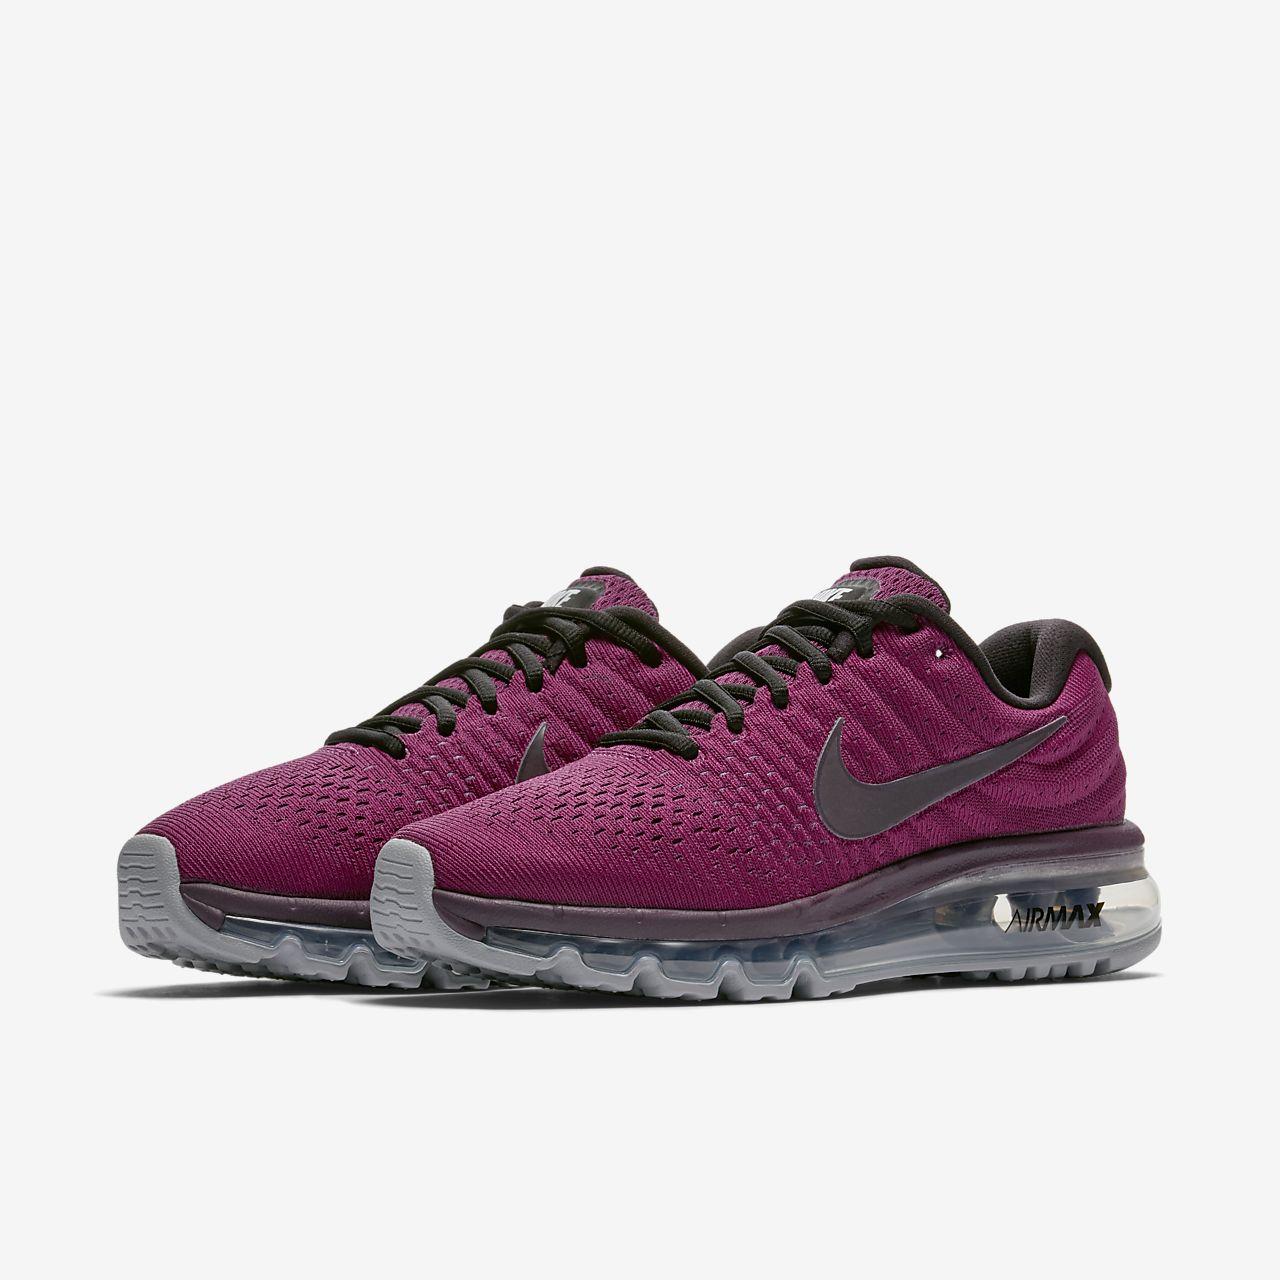 ... Chaussure de running Nike Air Max 2017 pour Femme